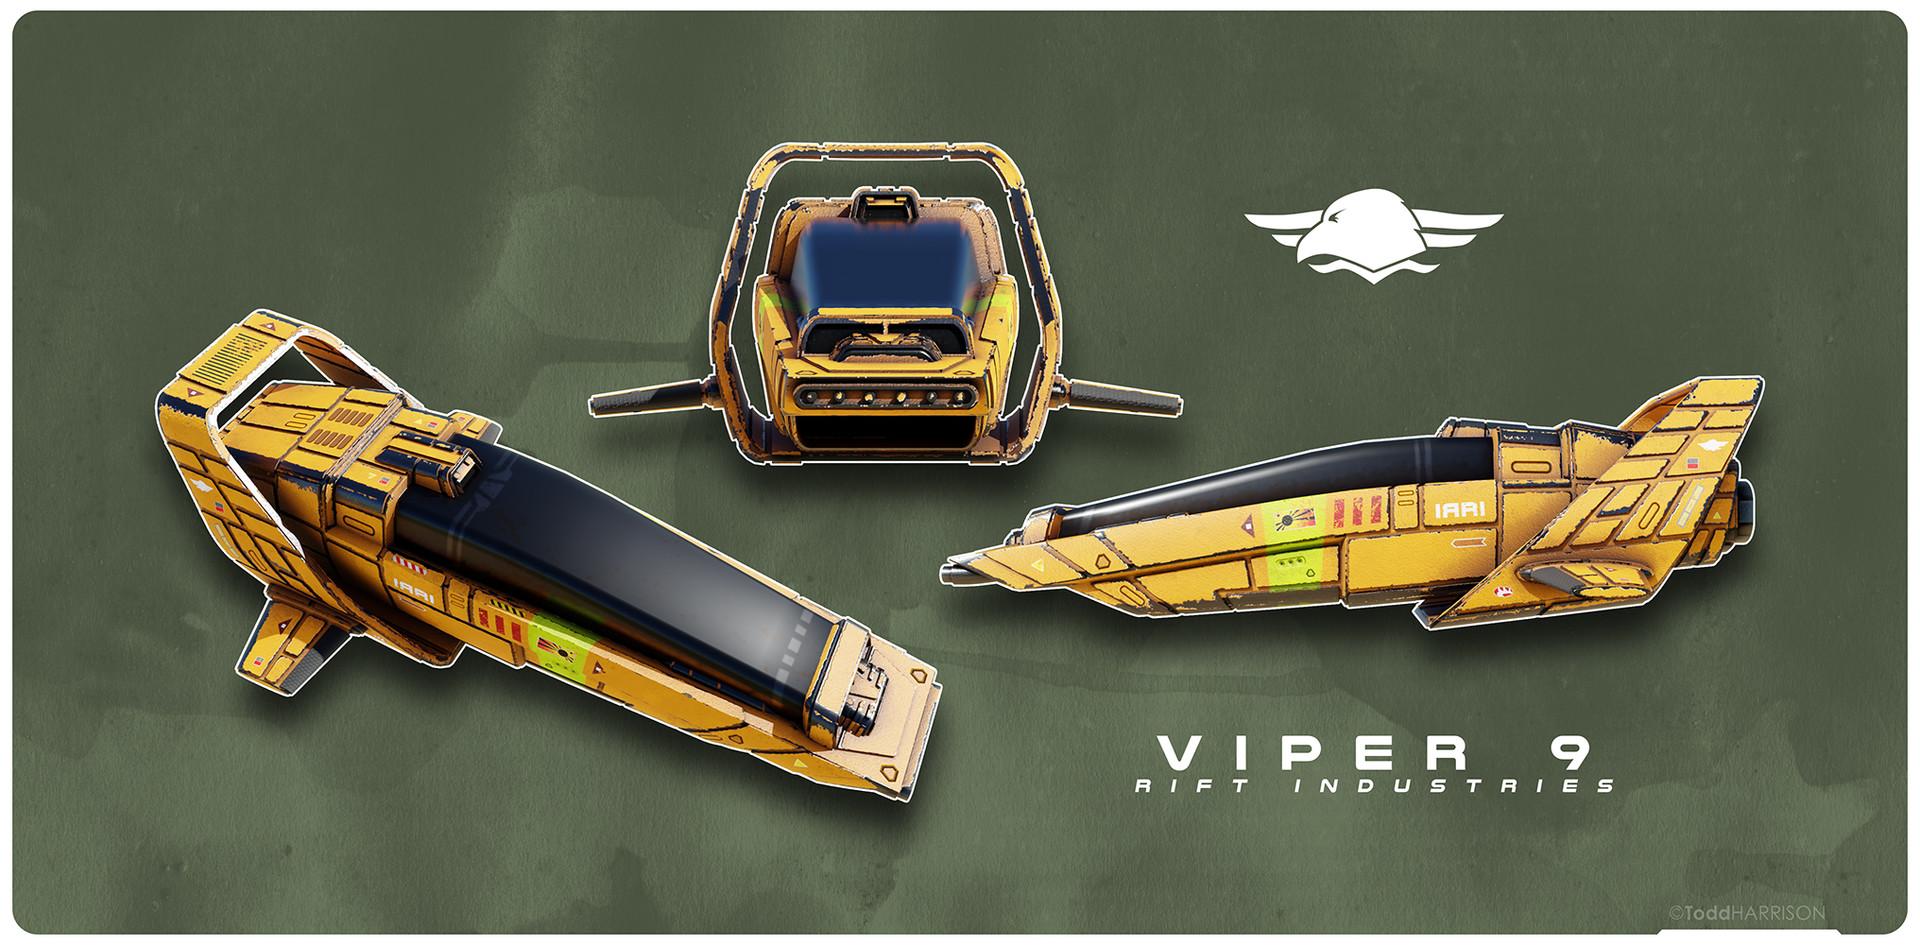 Todd harrison ri viper9 3v web